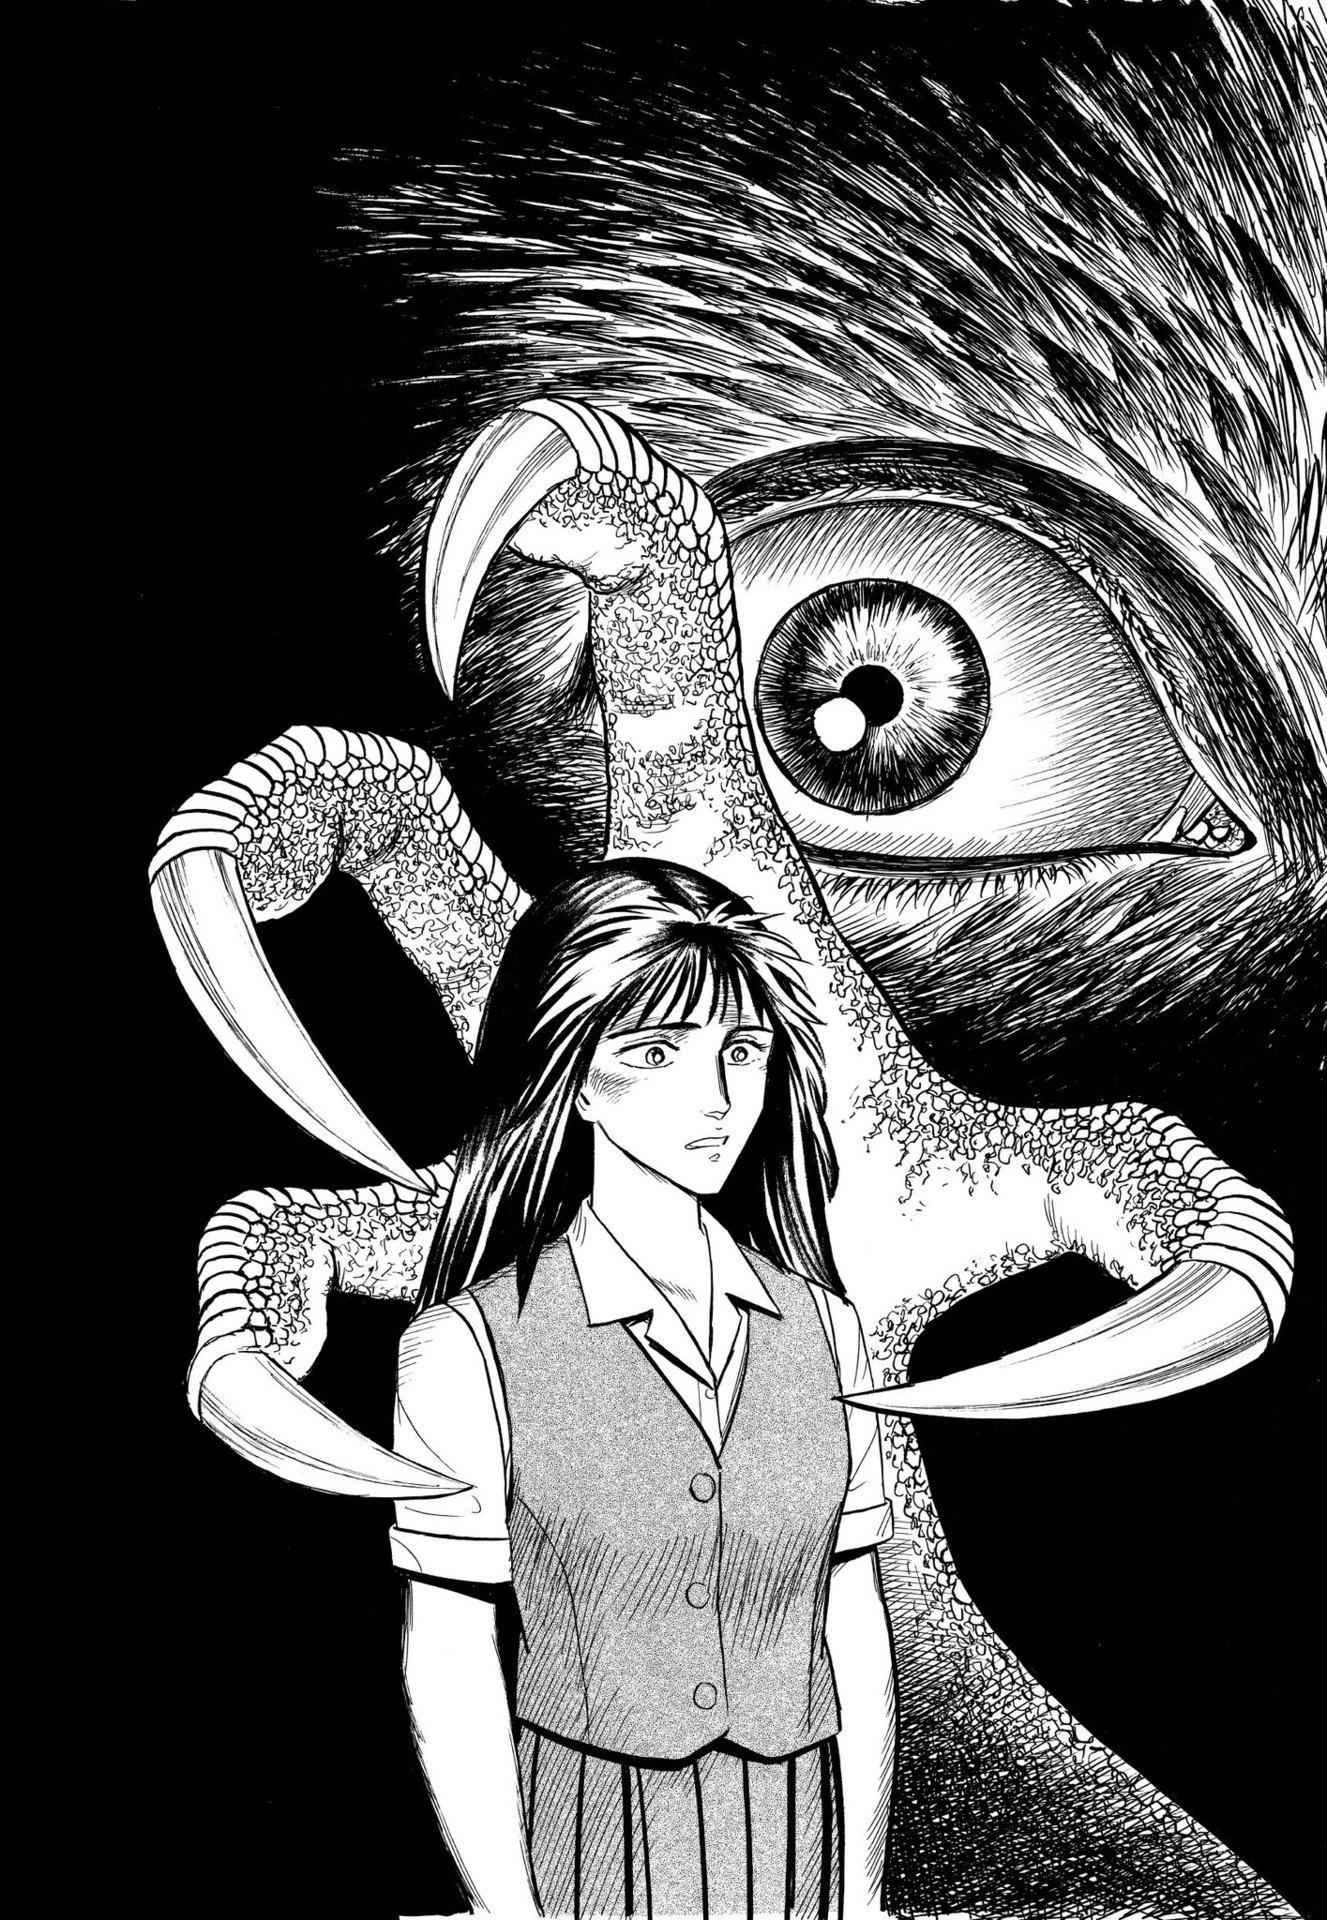 shikimori paraziták